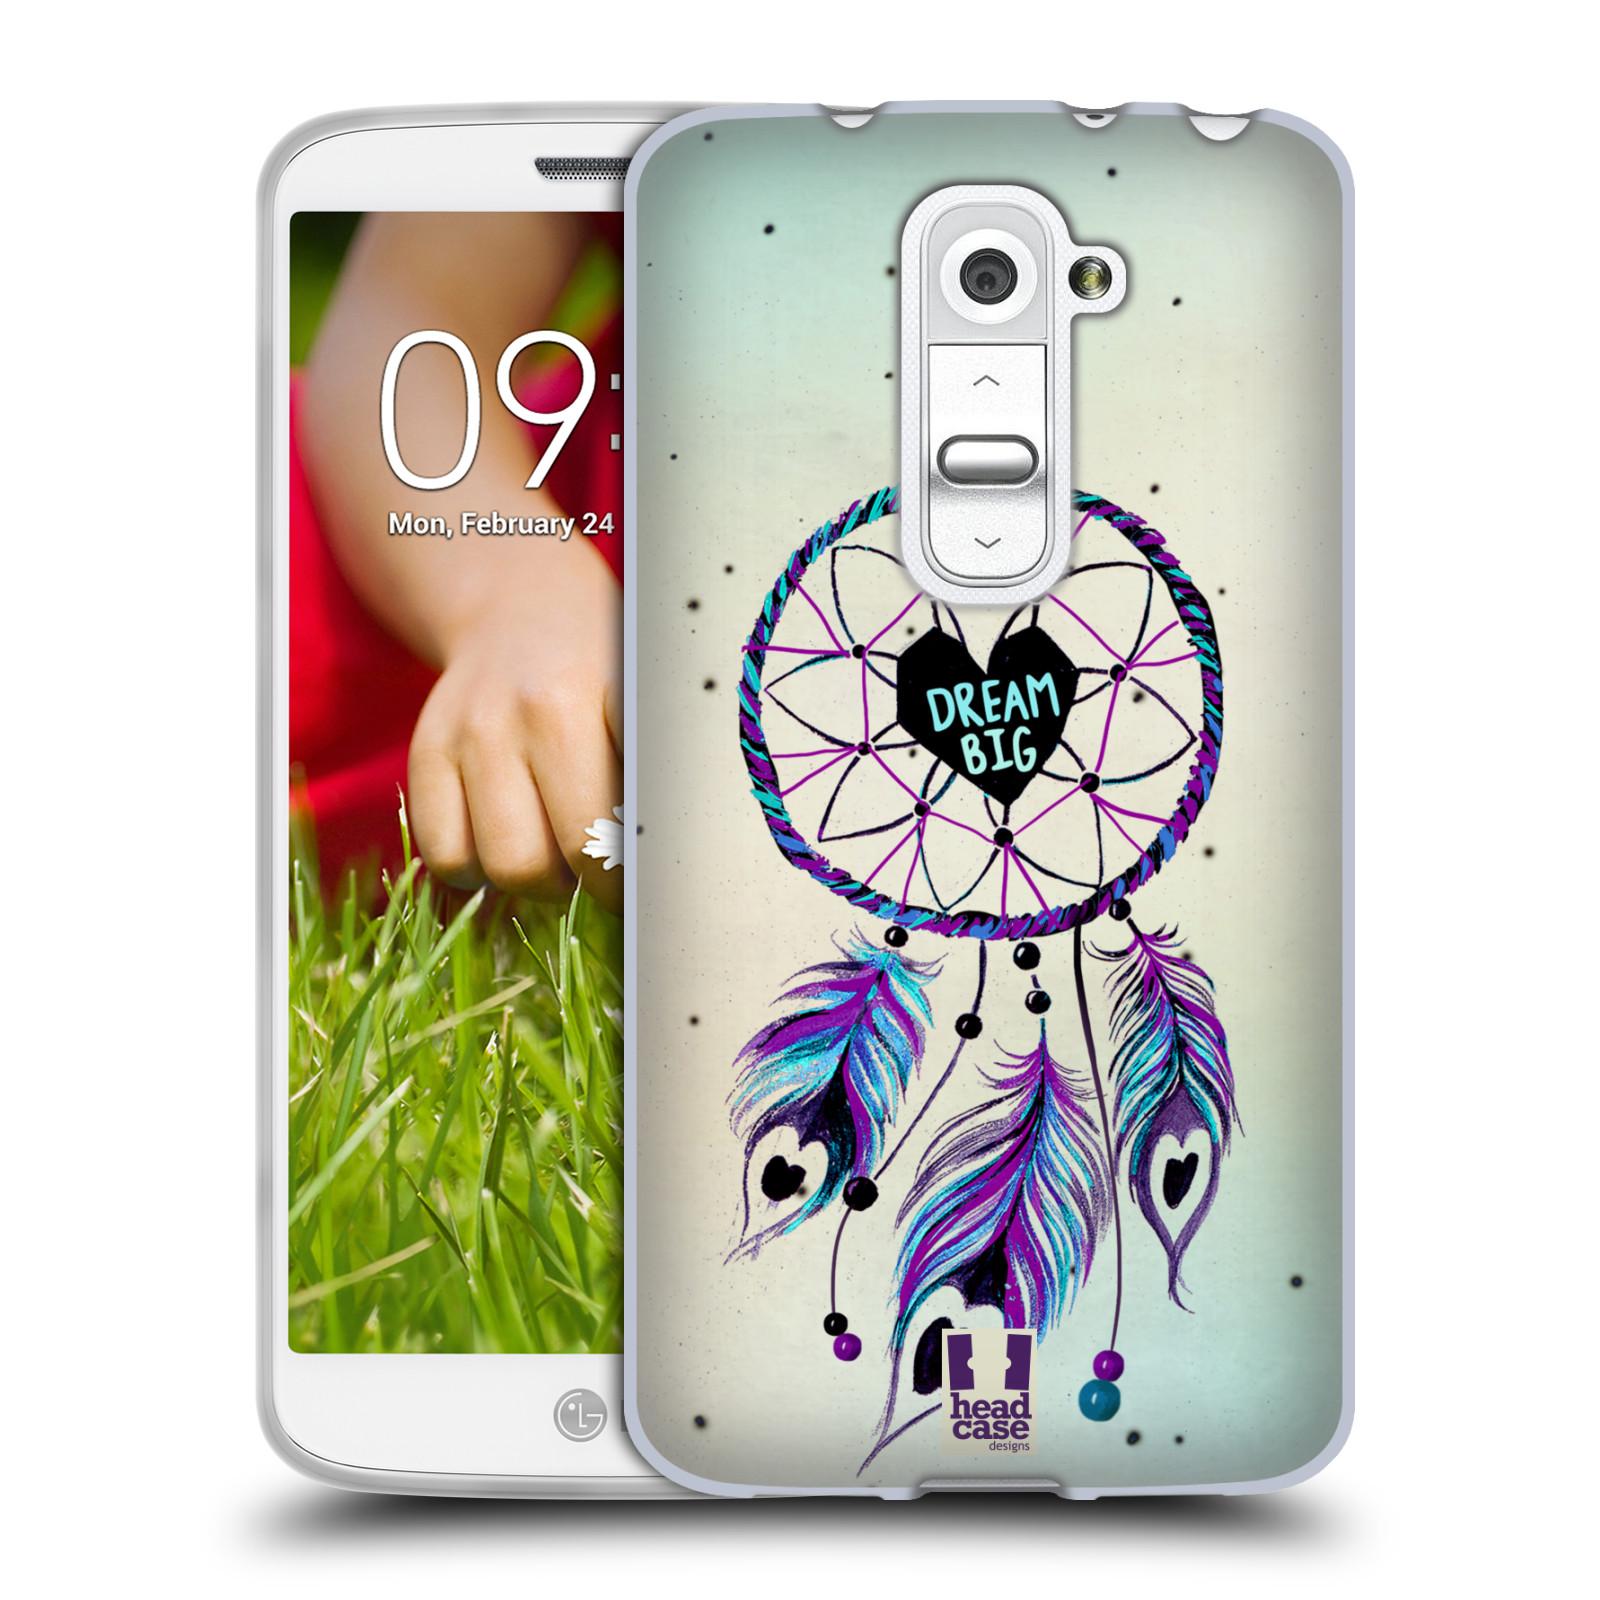 Silikonové pouzdro na mobil LG G2 Mini HEAD CASE Lapač Assorted Dream Big Srdce (Silikonový kryt či obal na mobilní telefon LG G2 Mini D620)